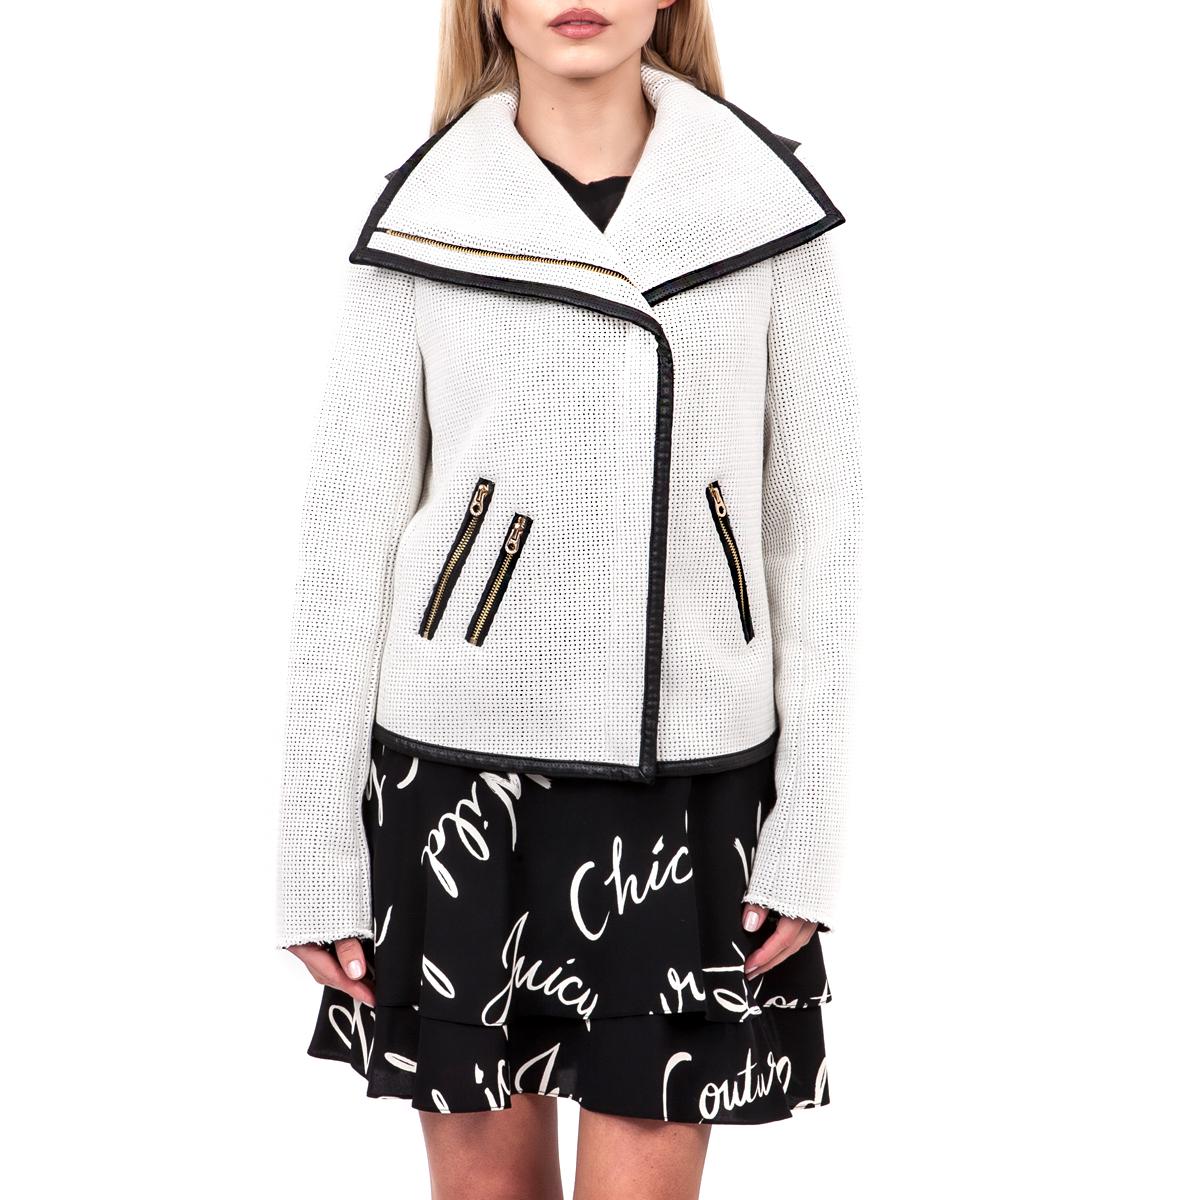 JUICY COUTURE - Γυναικείο μπουφάν Juicy Couture λευκό γυναικεία ρούχα πανωφόρια σακάκια